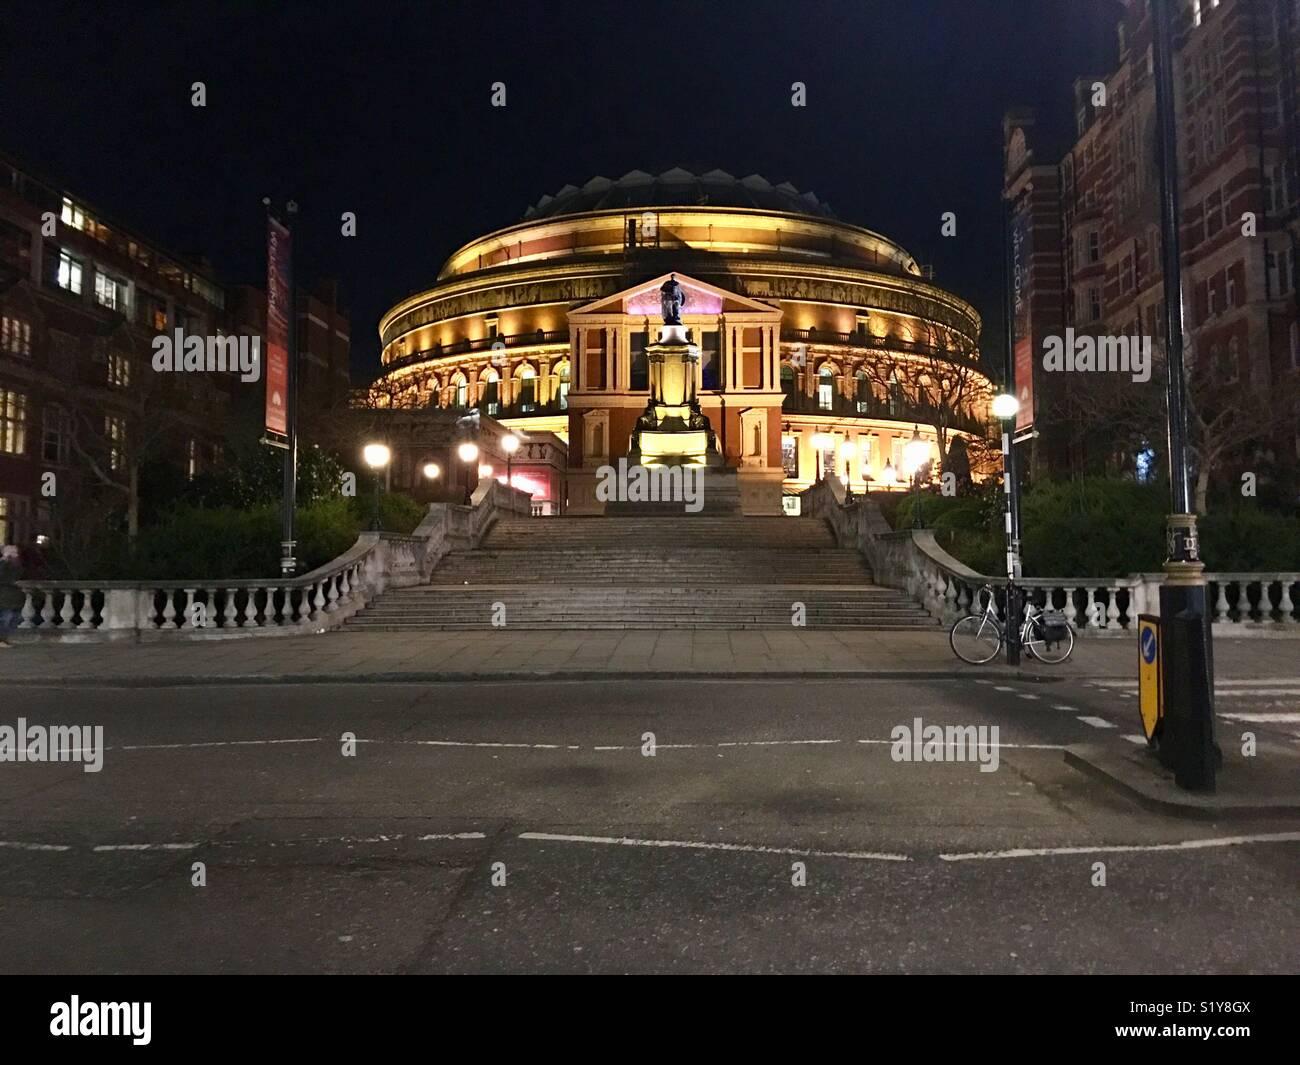 The royal Albert Hall at night - Stock Image